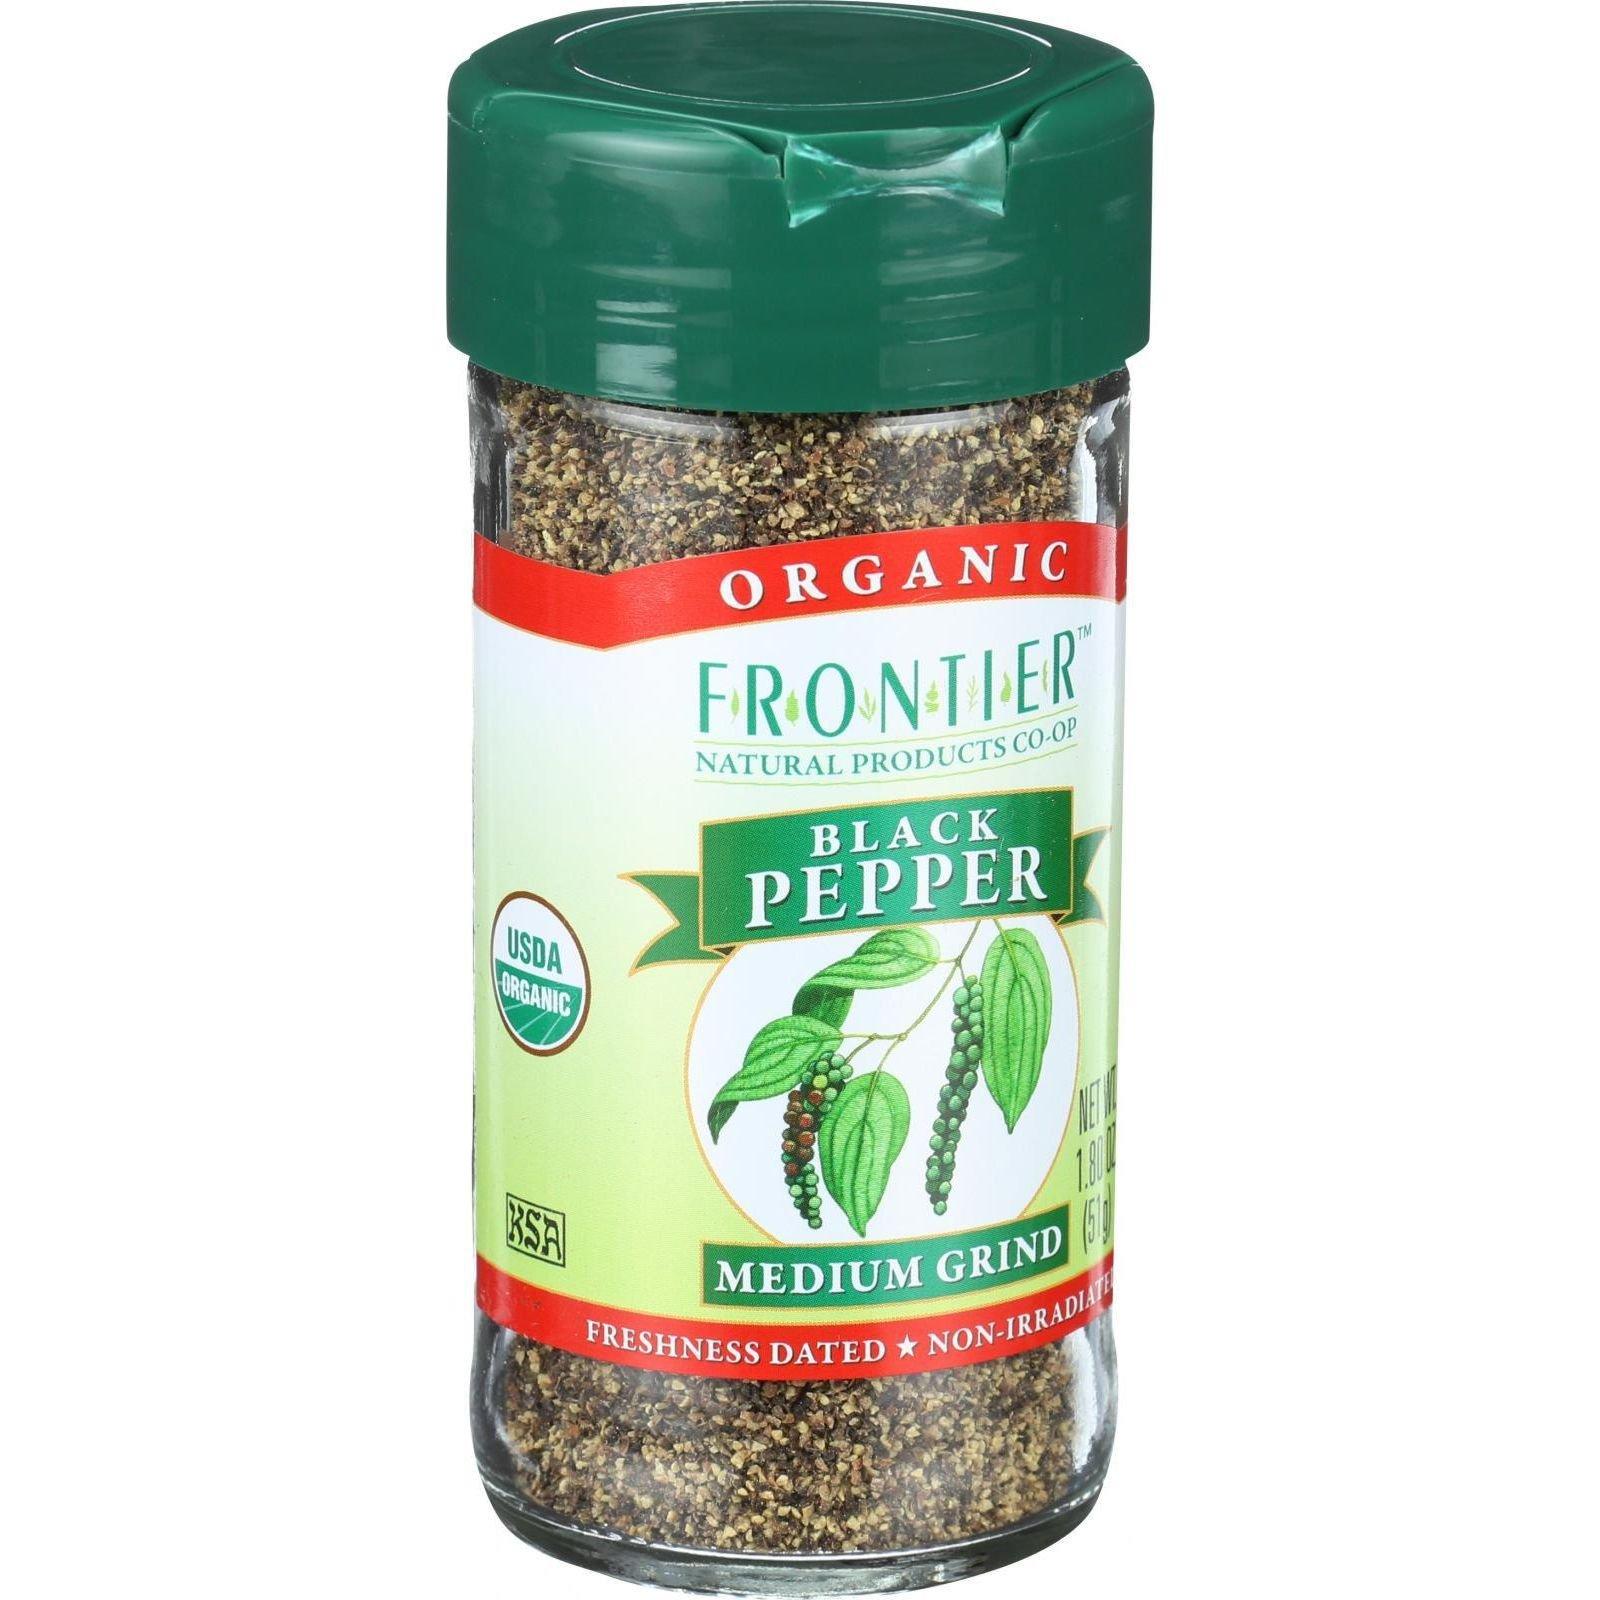 Black Pepper Medium Grind Organic - 1.8 oz